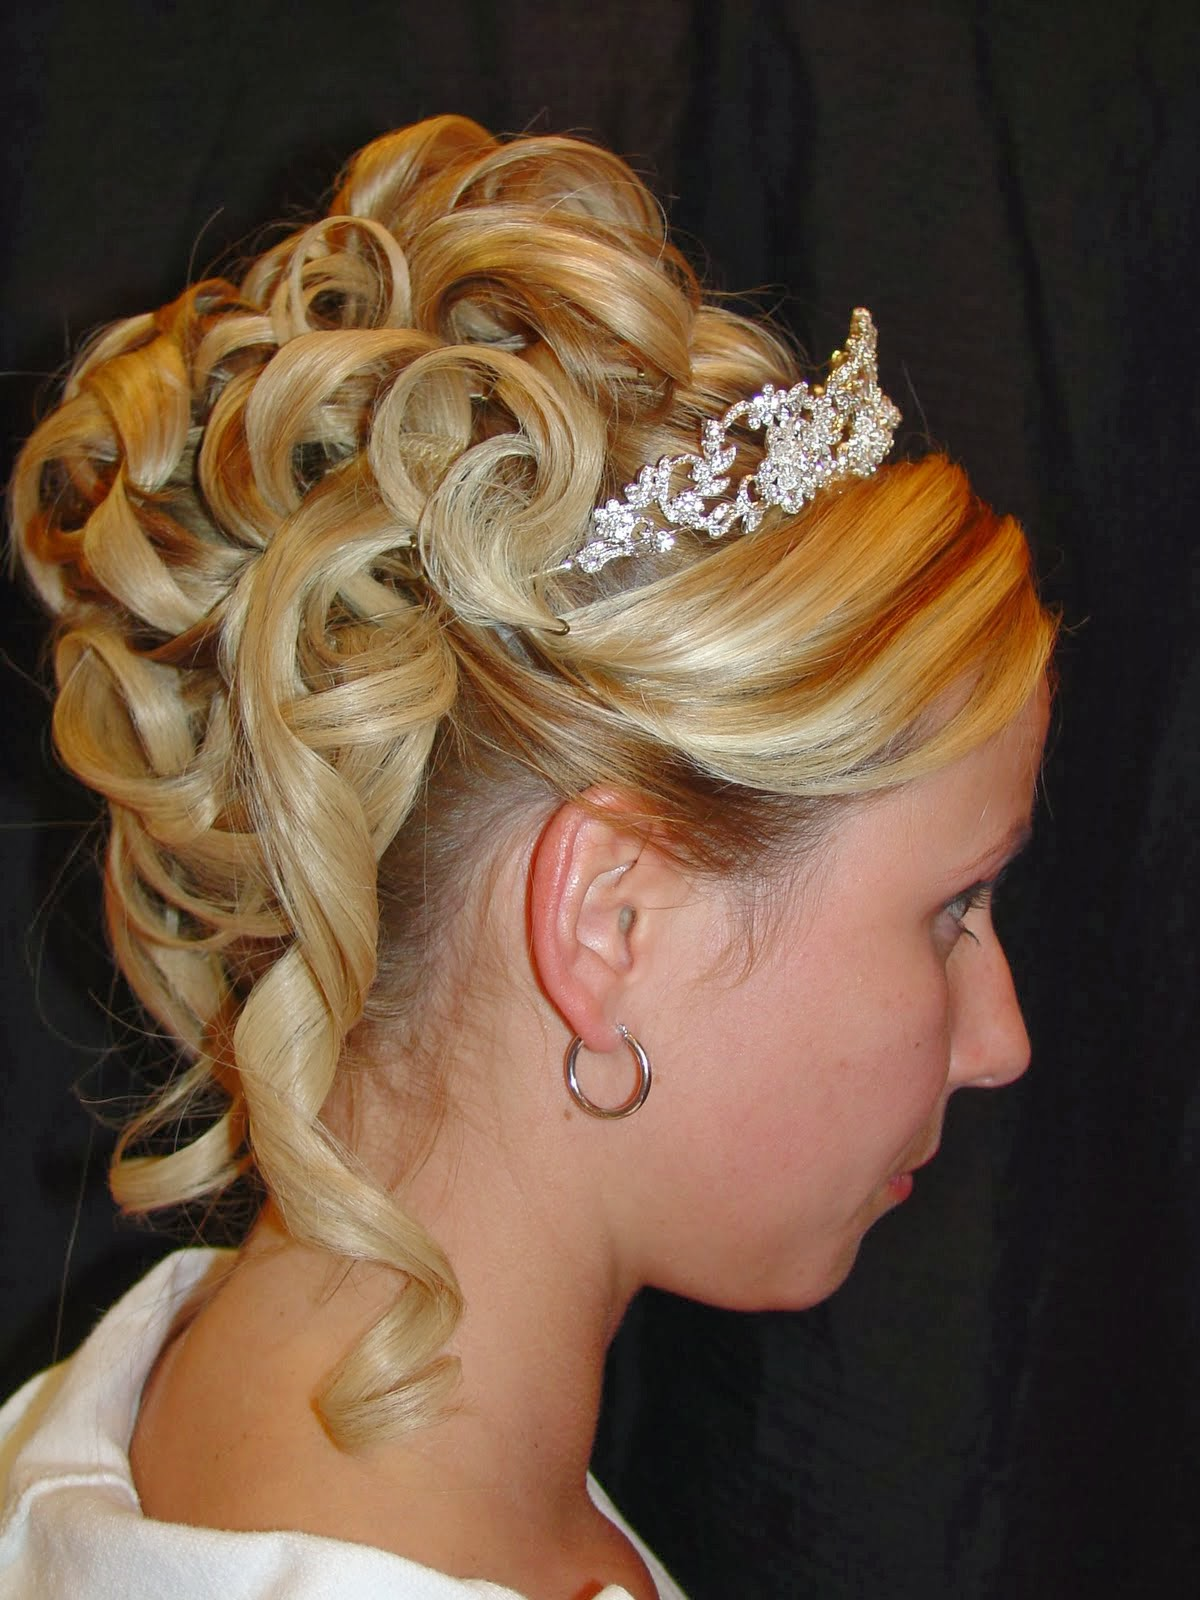 Top hairstyles for long hair braids : Hair Fashion Style ...